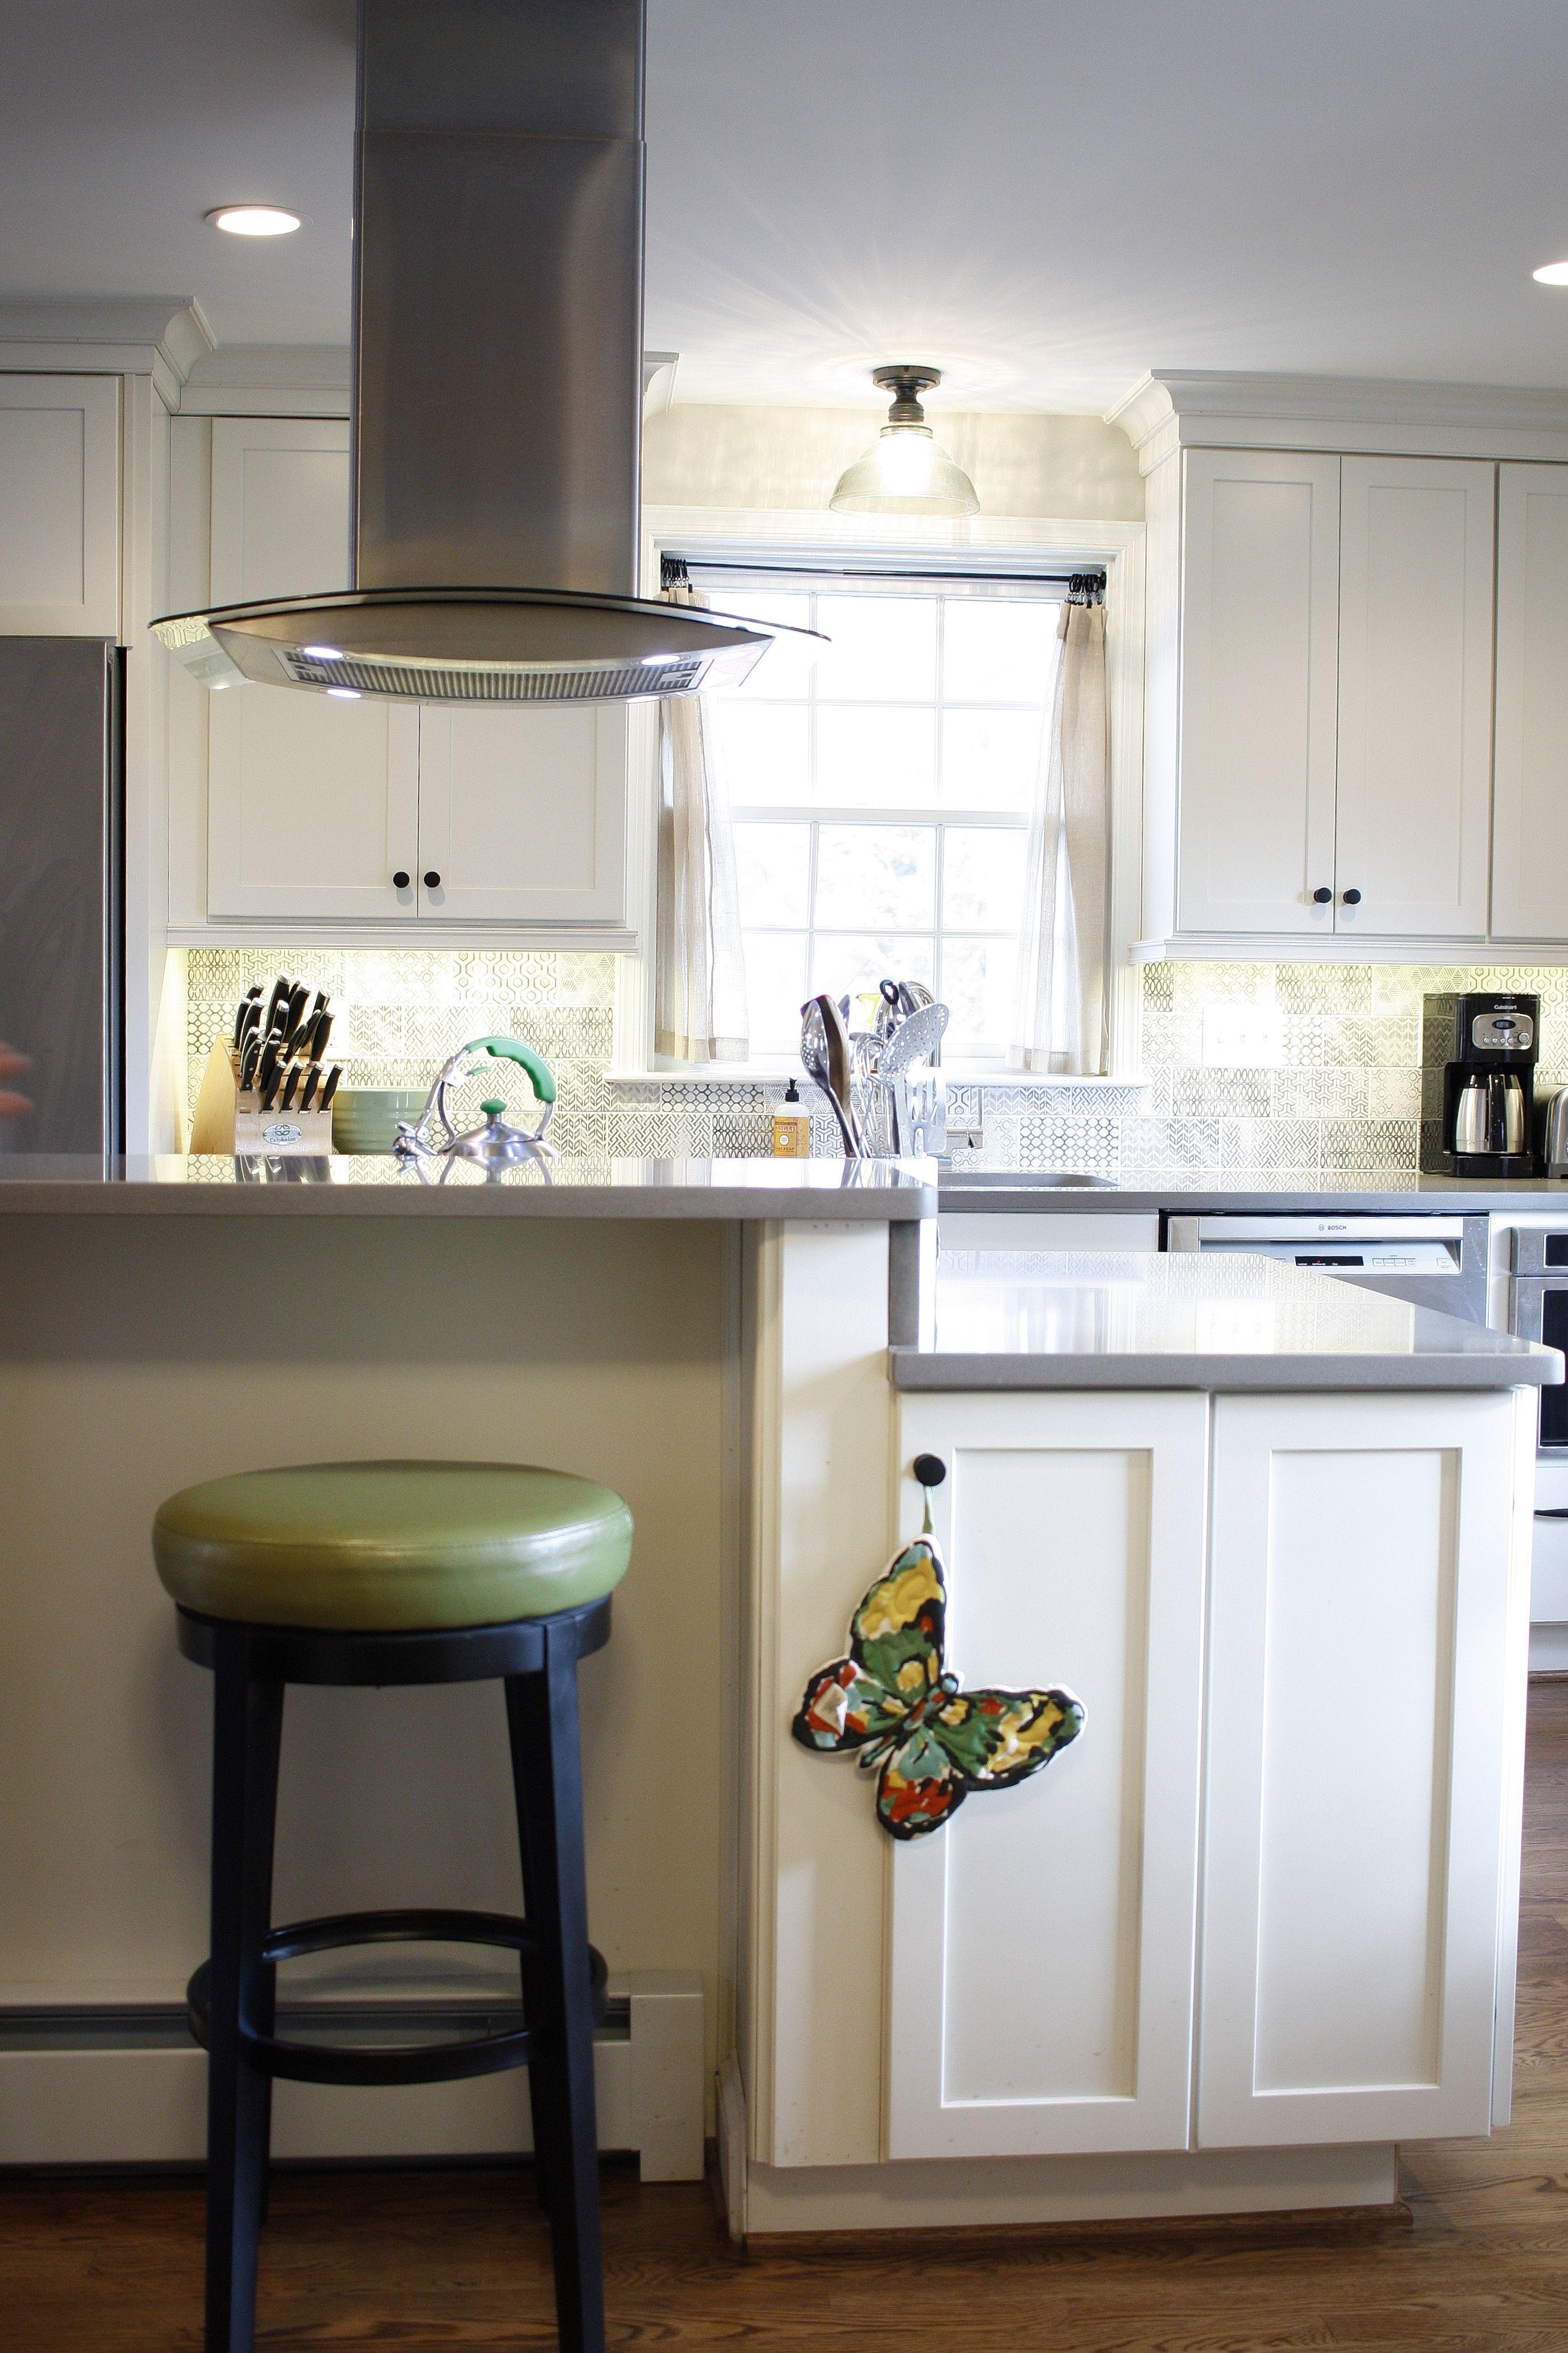 Farmhouse White Kitchen in Baltimore, MD | Traditional ...